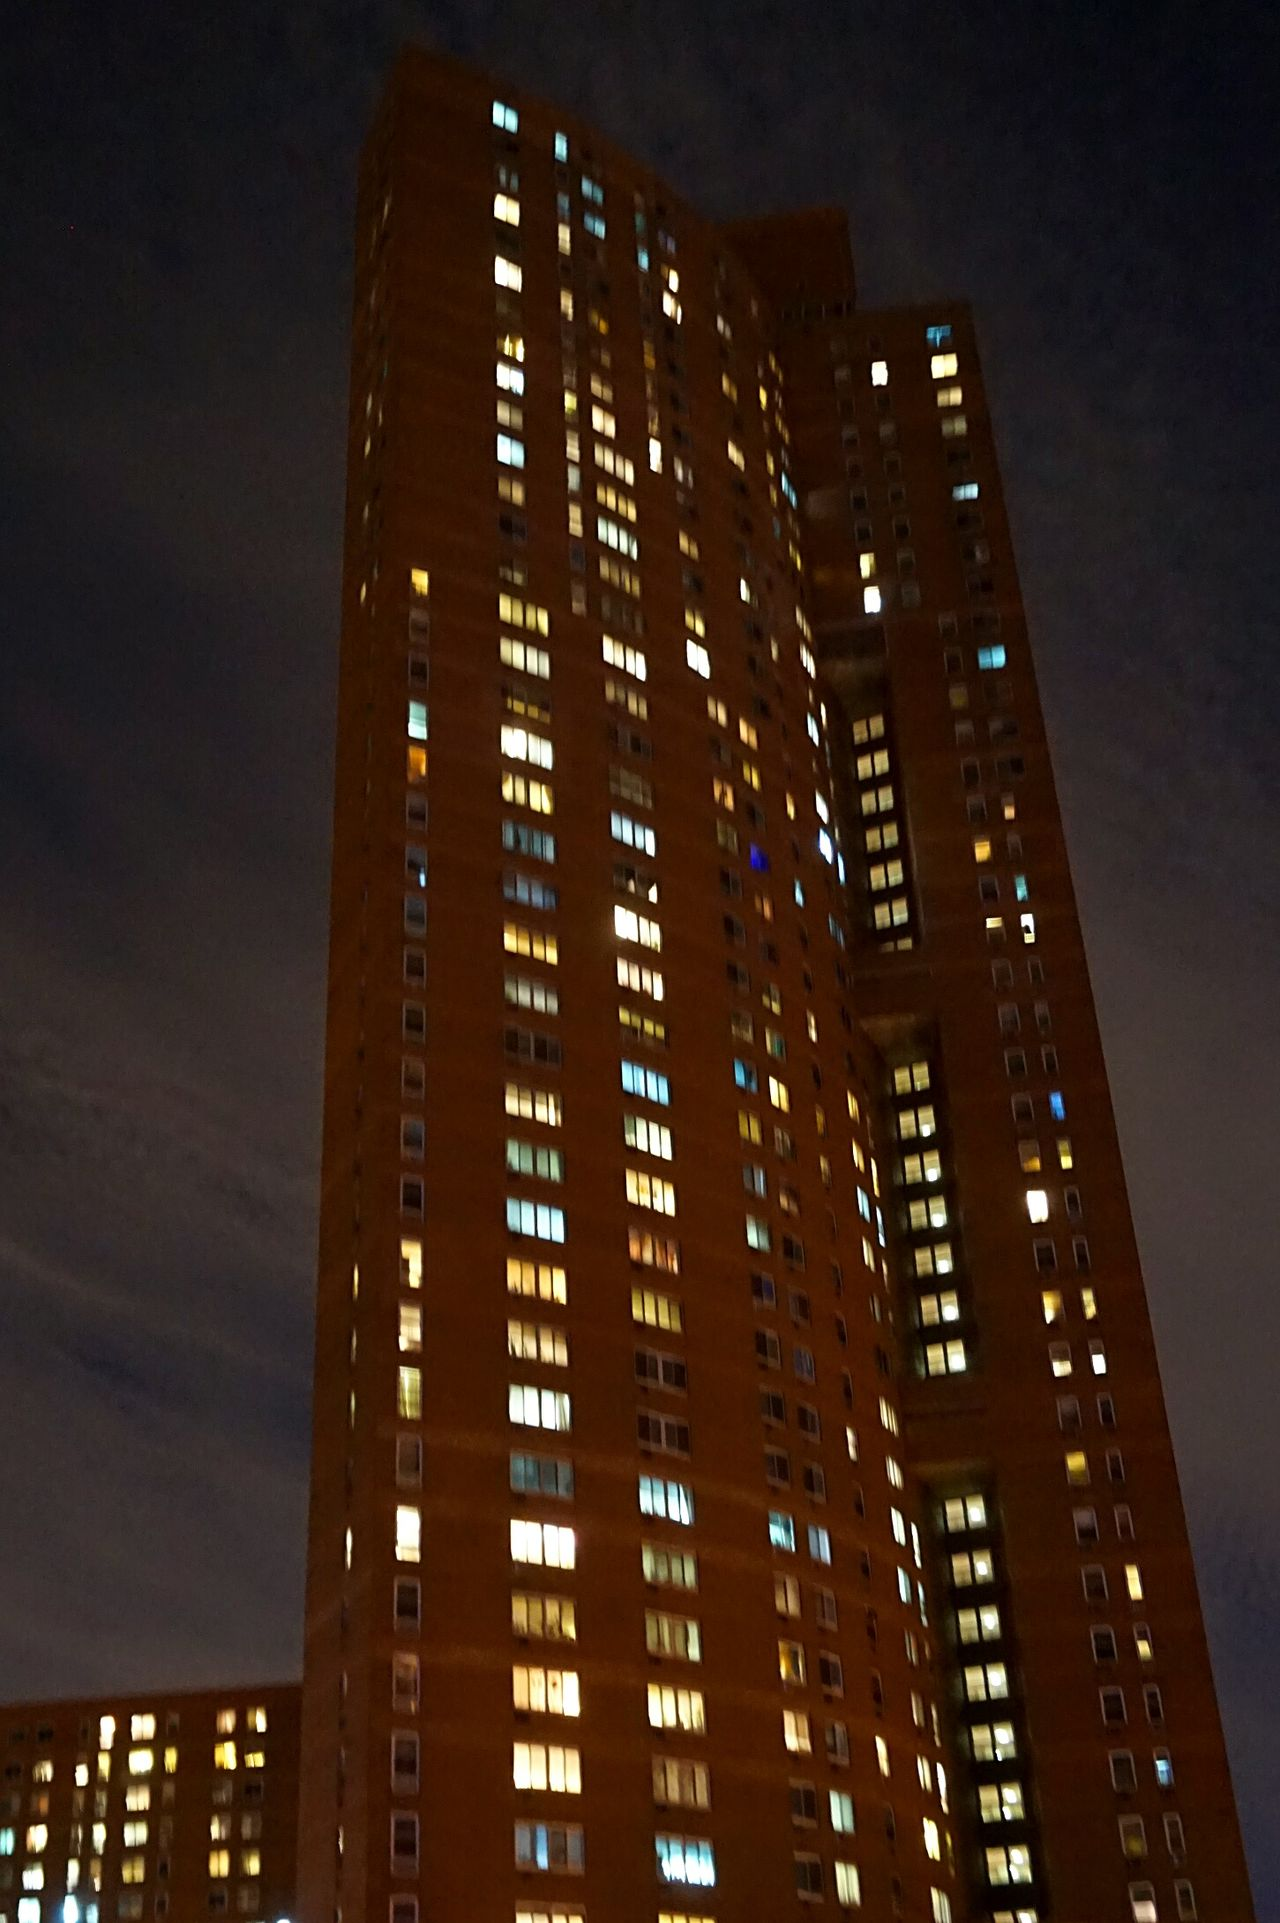 Skyscraper Urban Skyline Futuristic Urbanphotography Urban Exploration No People Building Exterior Illuminated Minimalist Architecture Architecture_collection Cityscape Chinatown New York Apartment Building